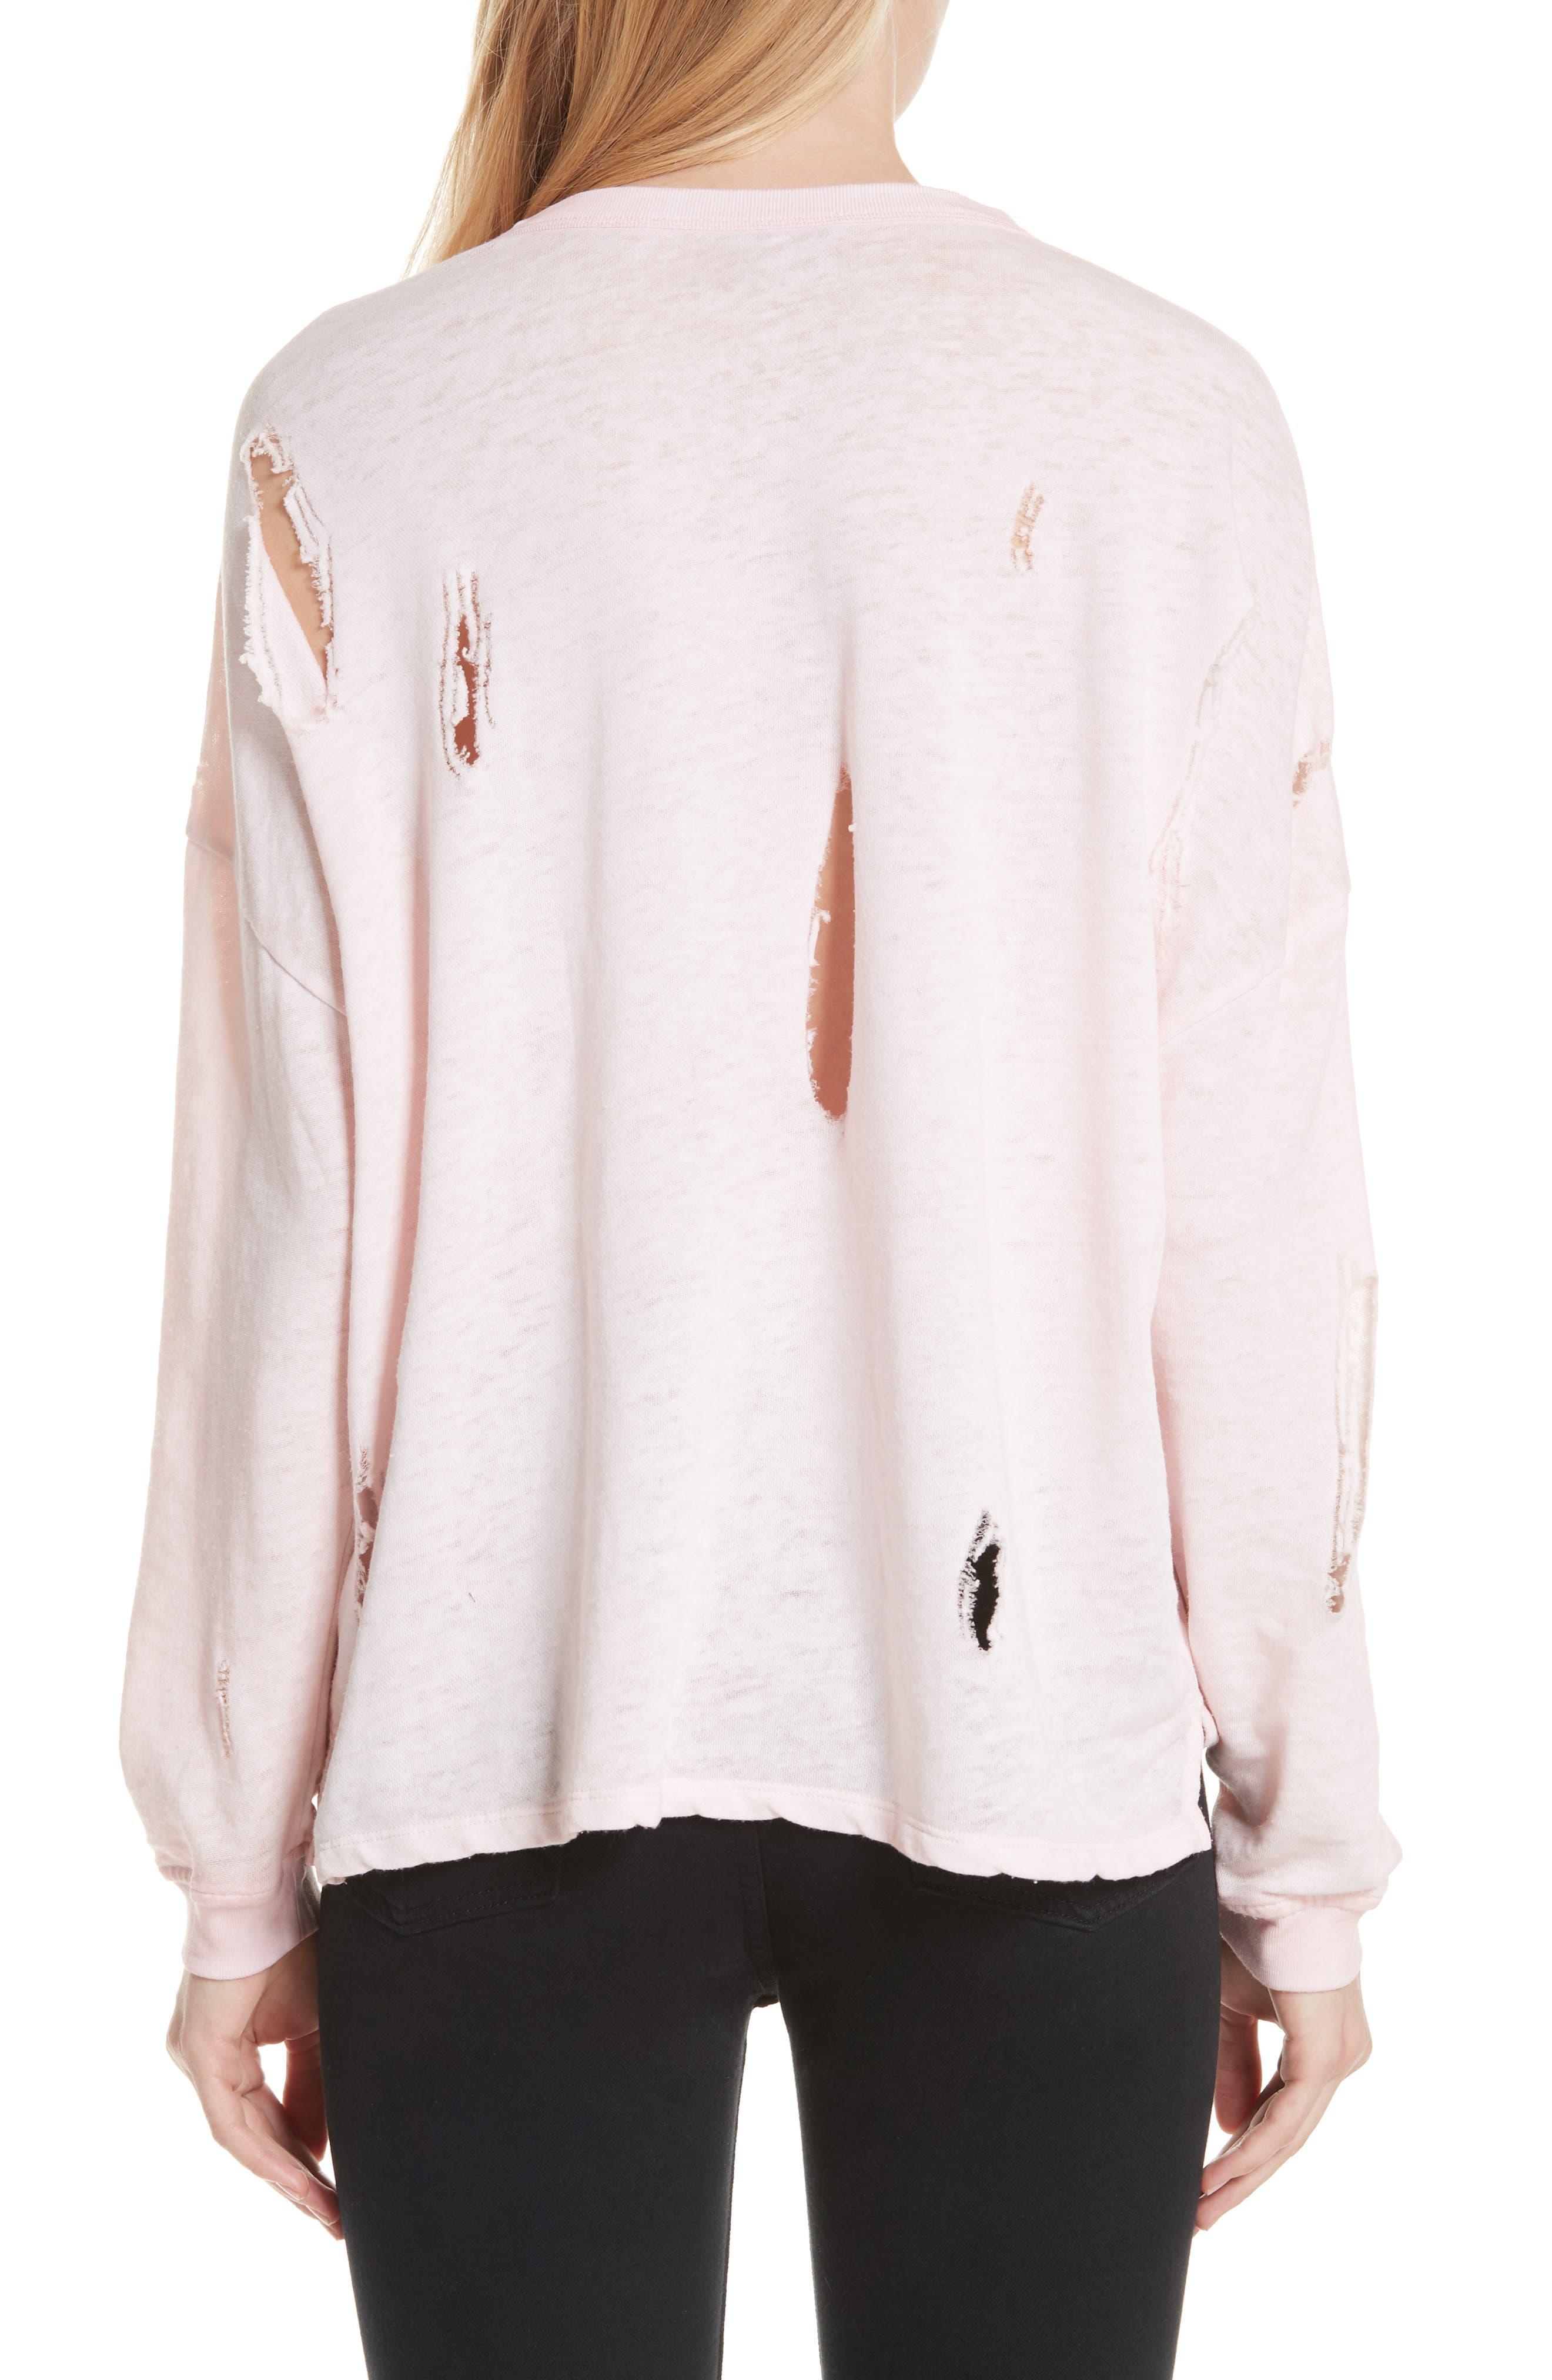 Lyzza Distressed Sweatshirt,                             Alternate thumbnail 2, color,                             Pink Sand